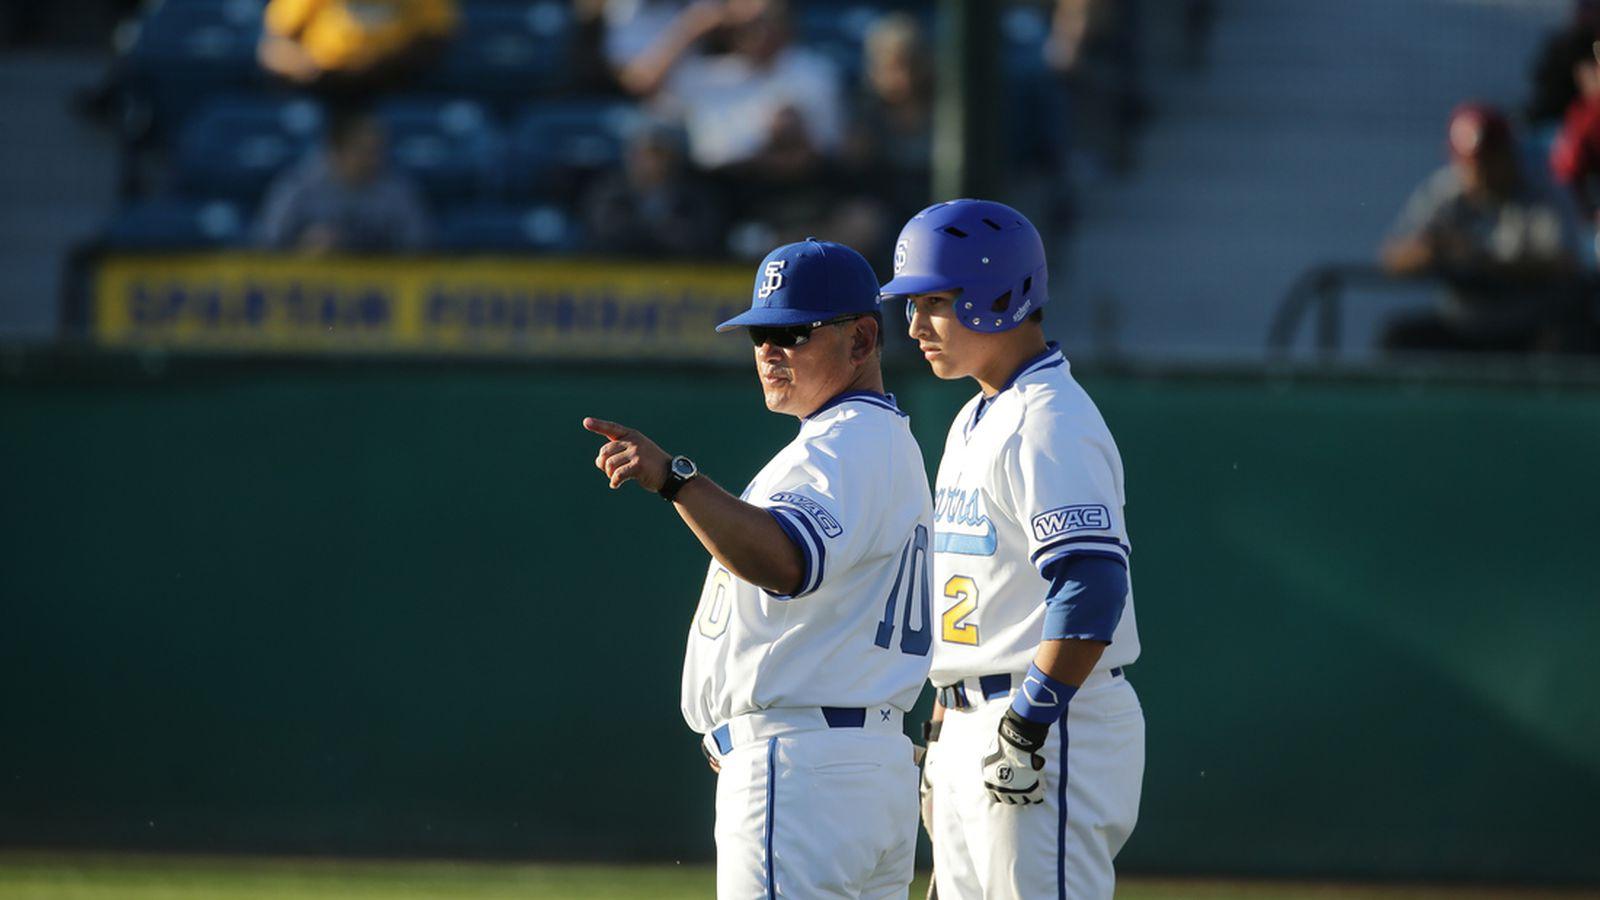 Fineas Del Bonta-Smith lights out as closer for San Jose ... |San Jose State Baseball